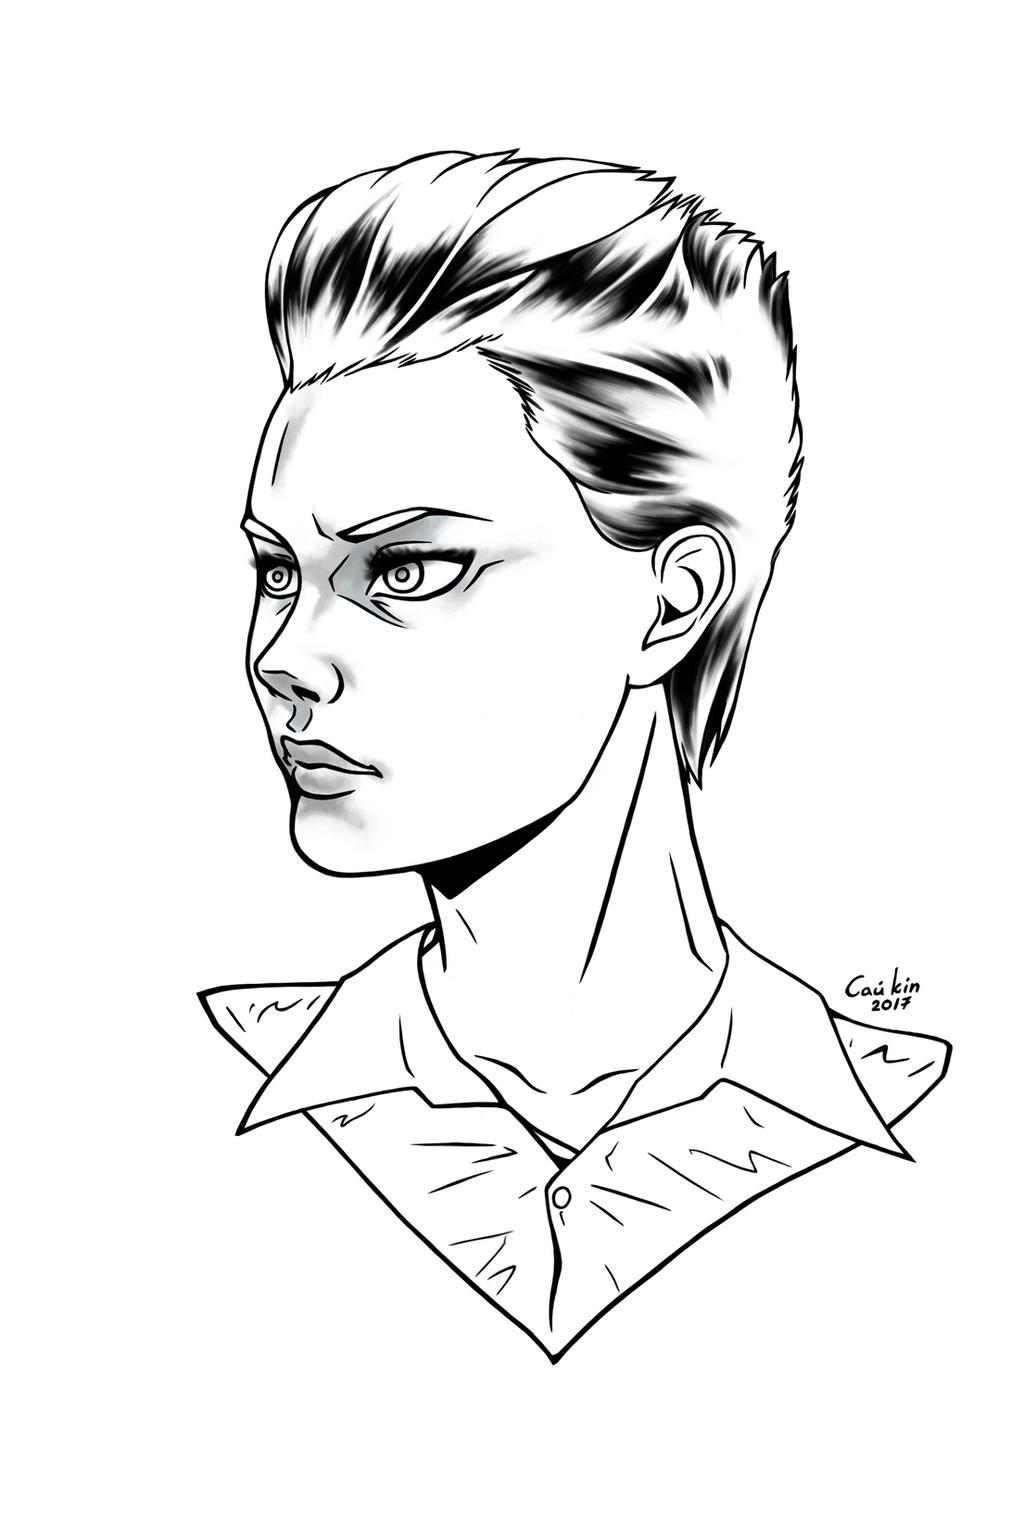 Digital sketch by sai-kin